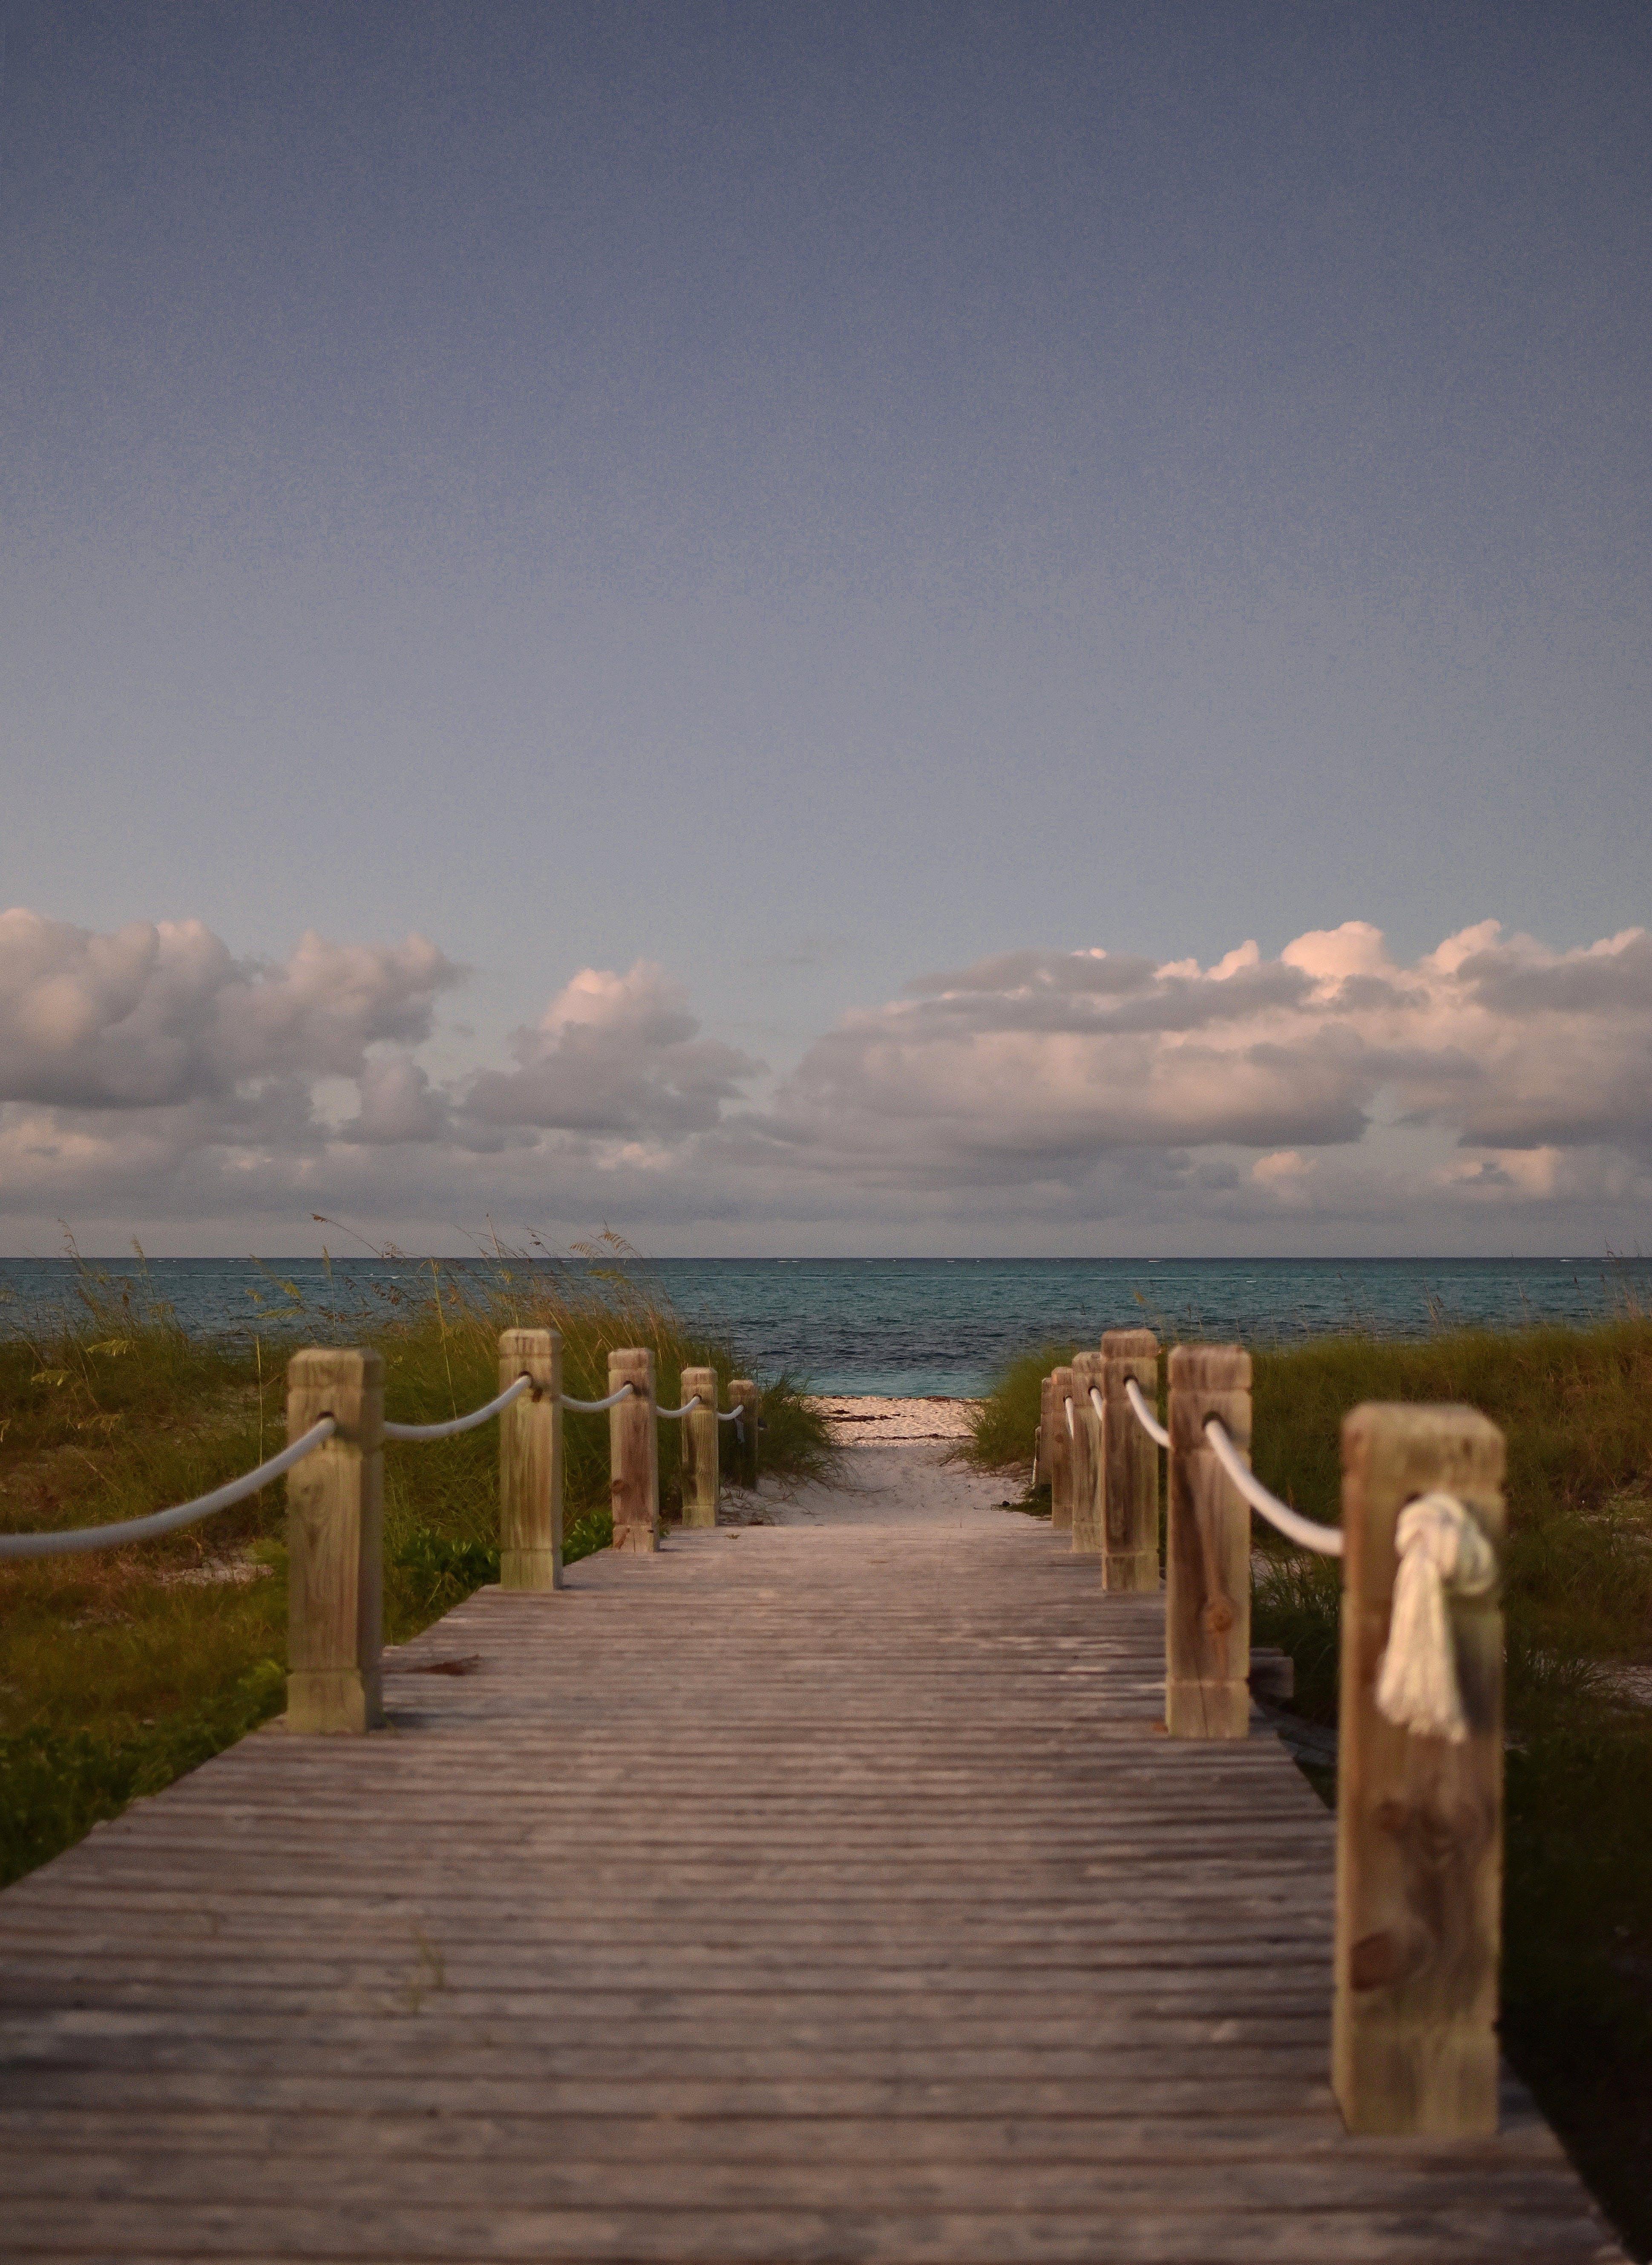 Free stock photo of beach, boardwalk, dusk, ocean